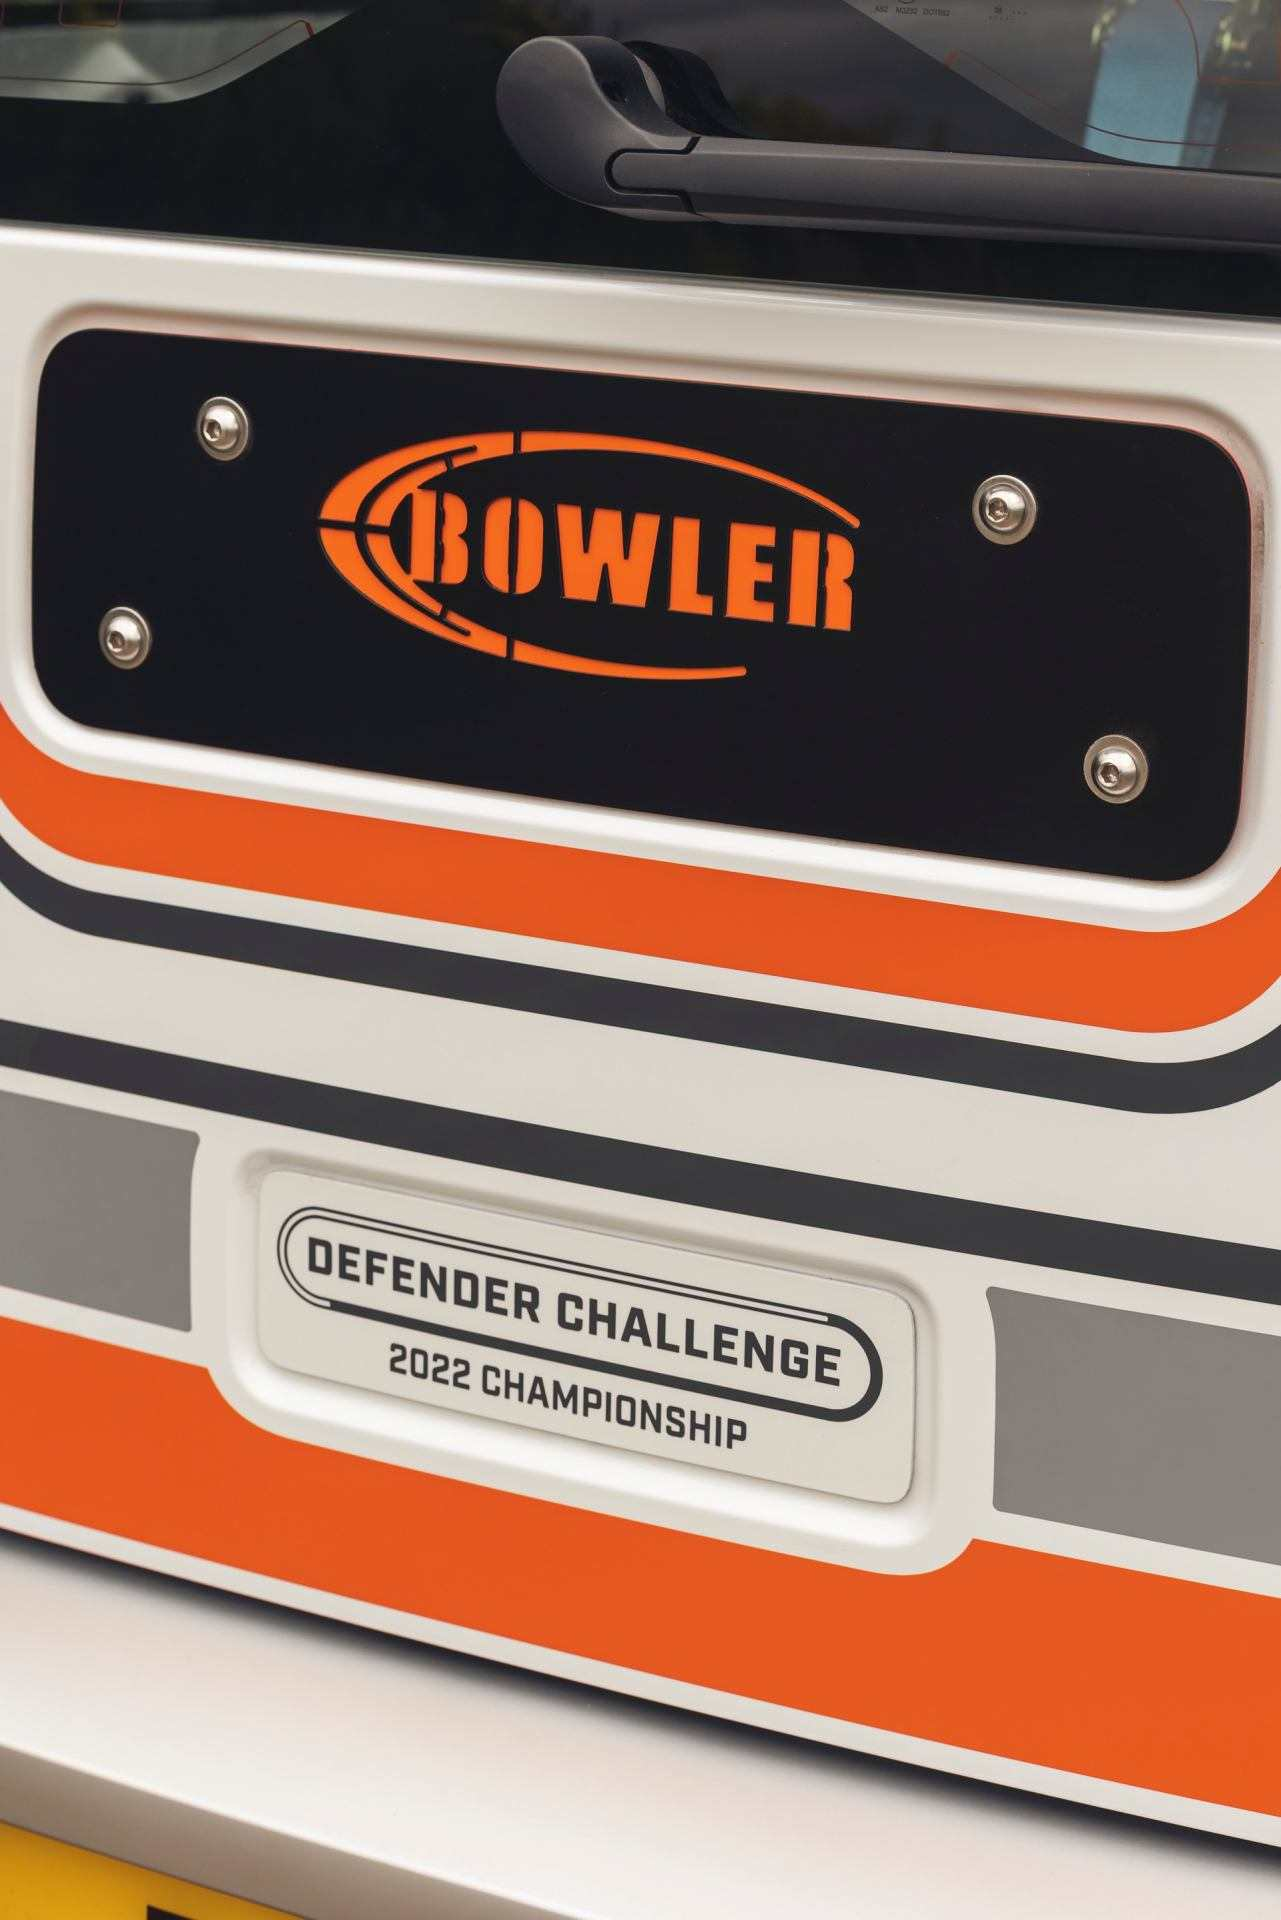 Bowler-Land-Rover-Defender-Challenge-Rally-Car-43